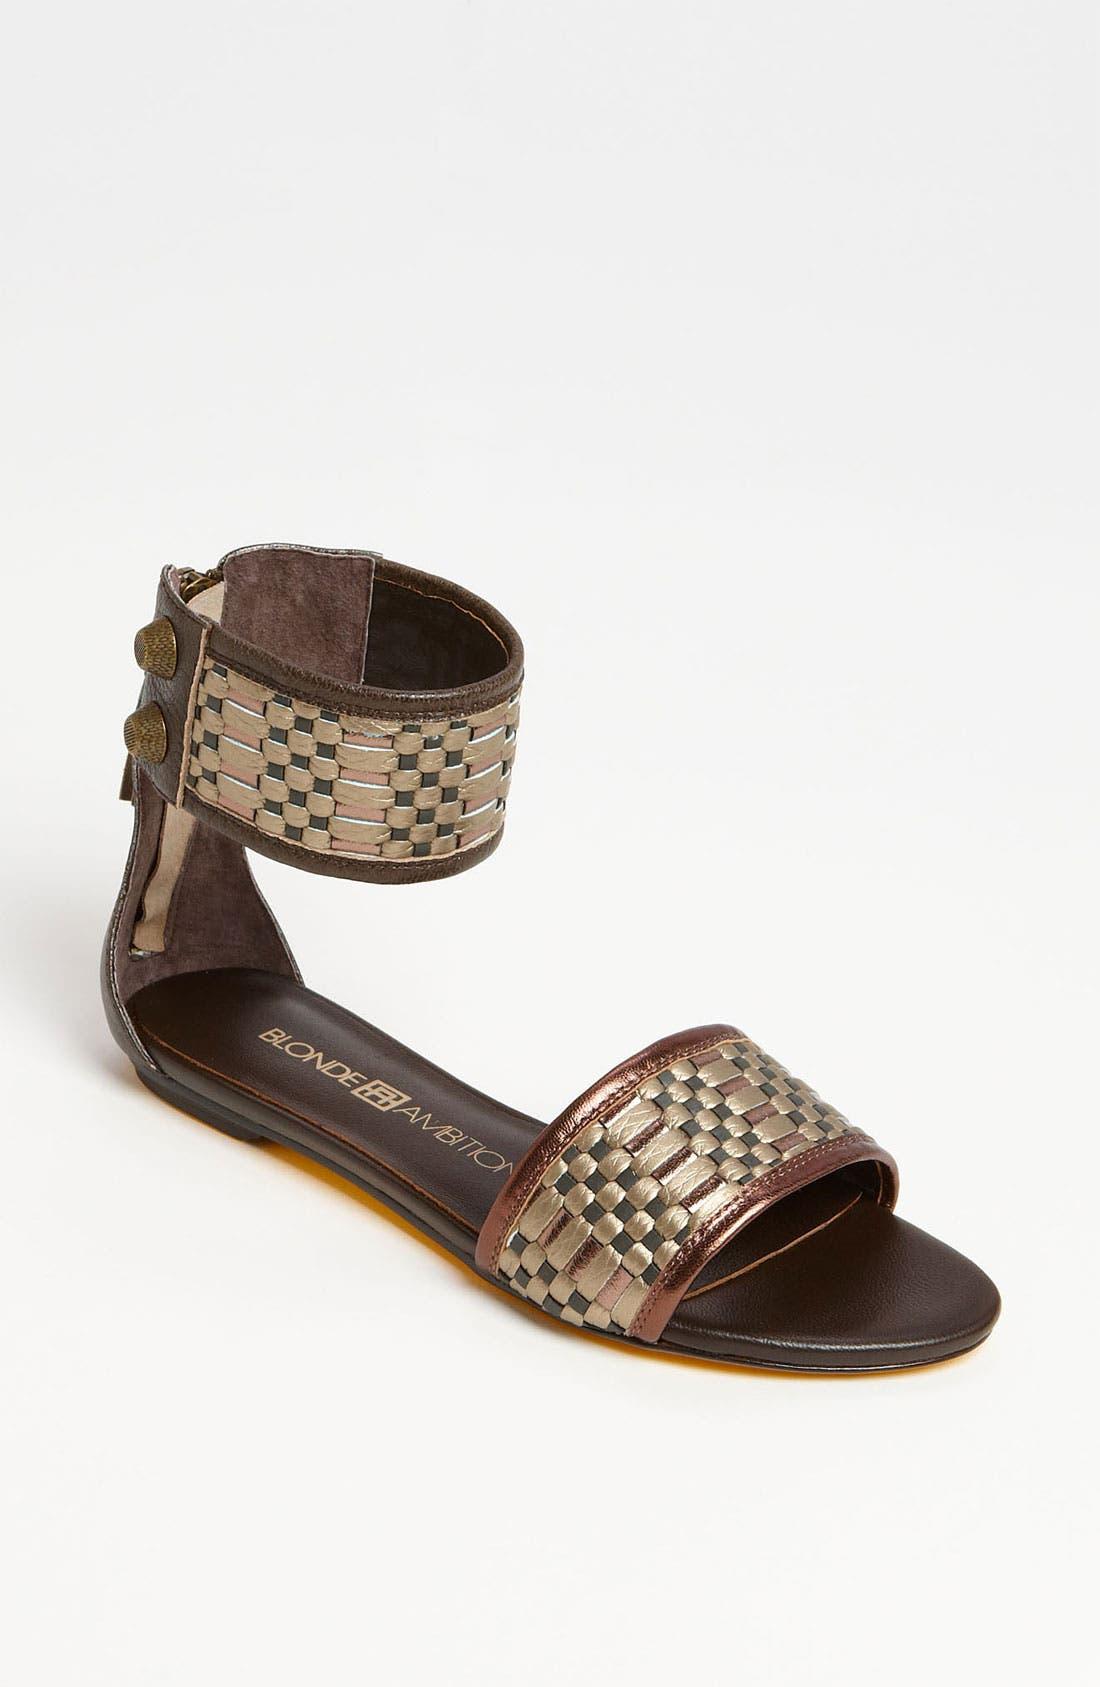 Alternate Image 1 Selected - Blonde Ambition 'Veloz' Sandal